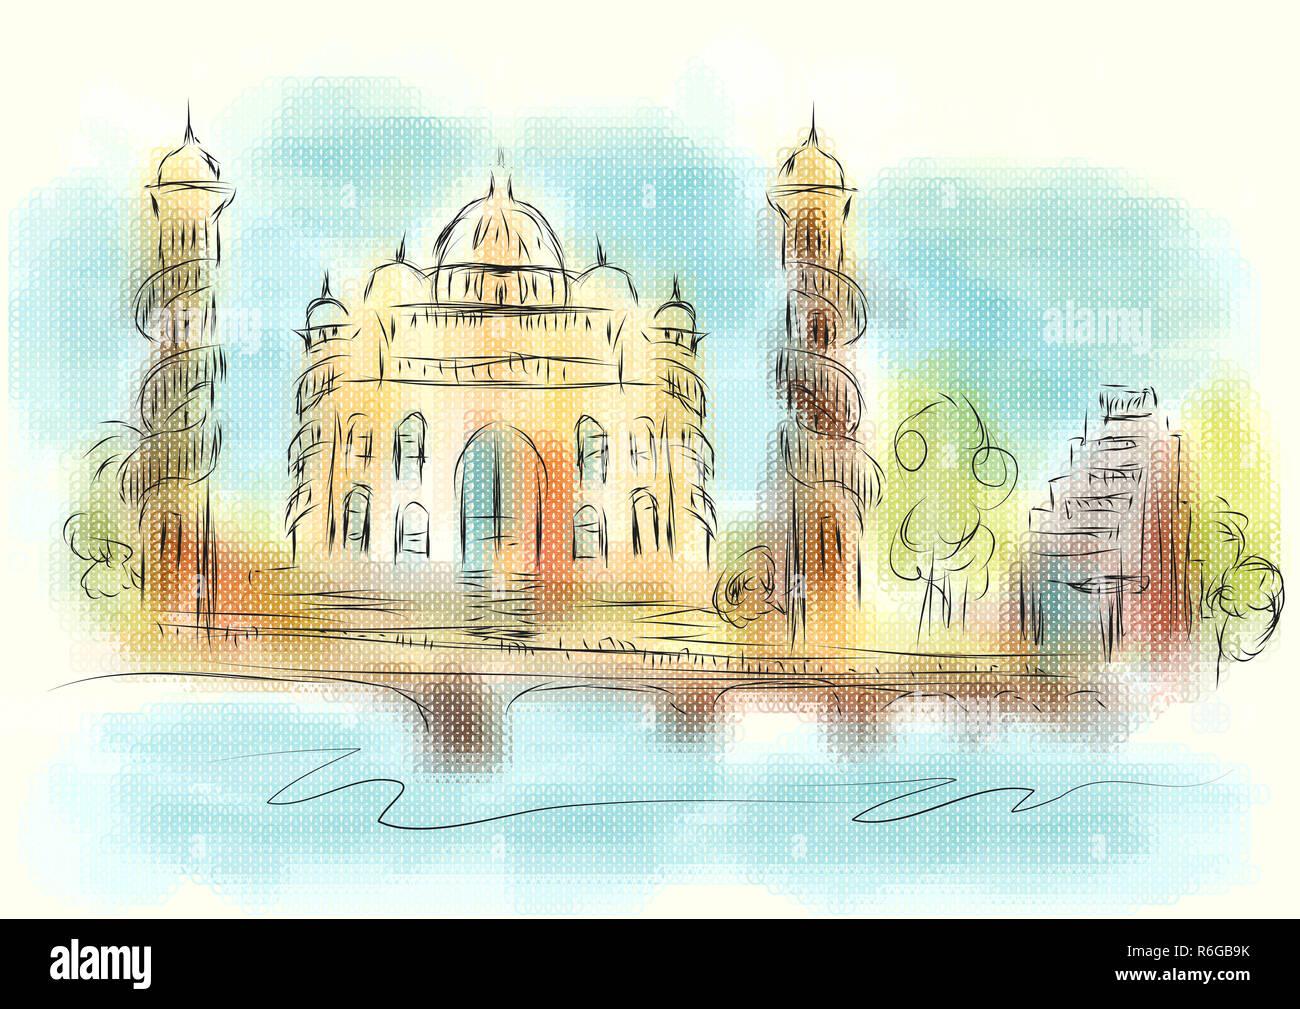 Ahmedabad abstract illustration - Stock Image